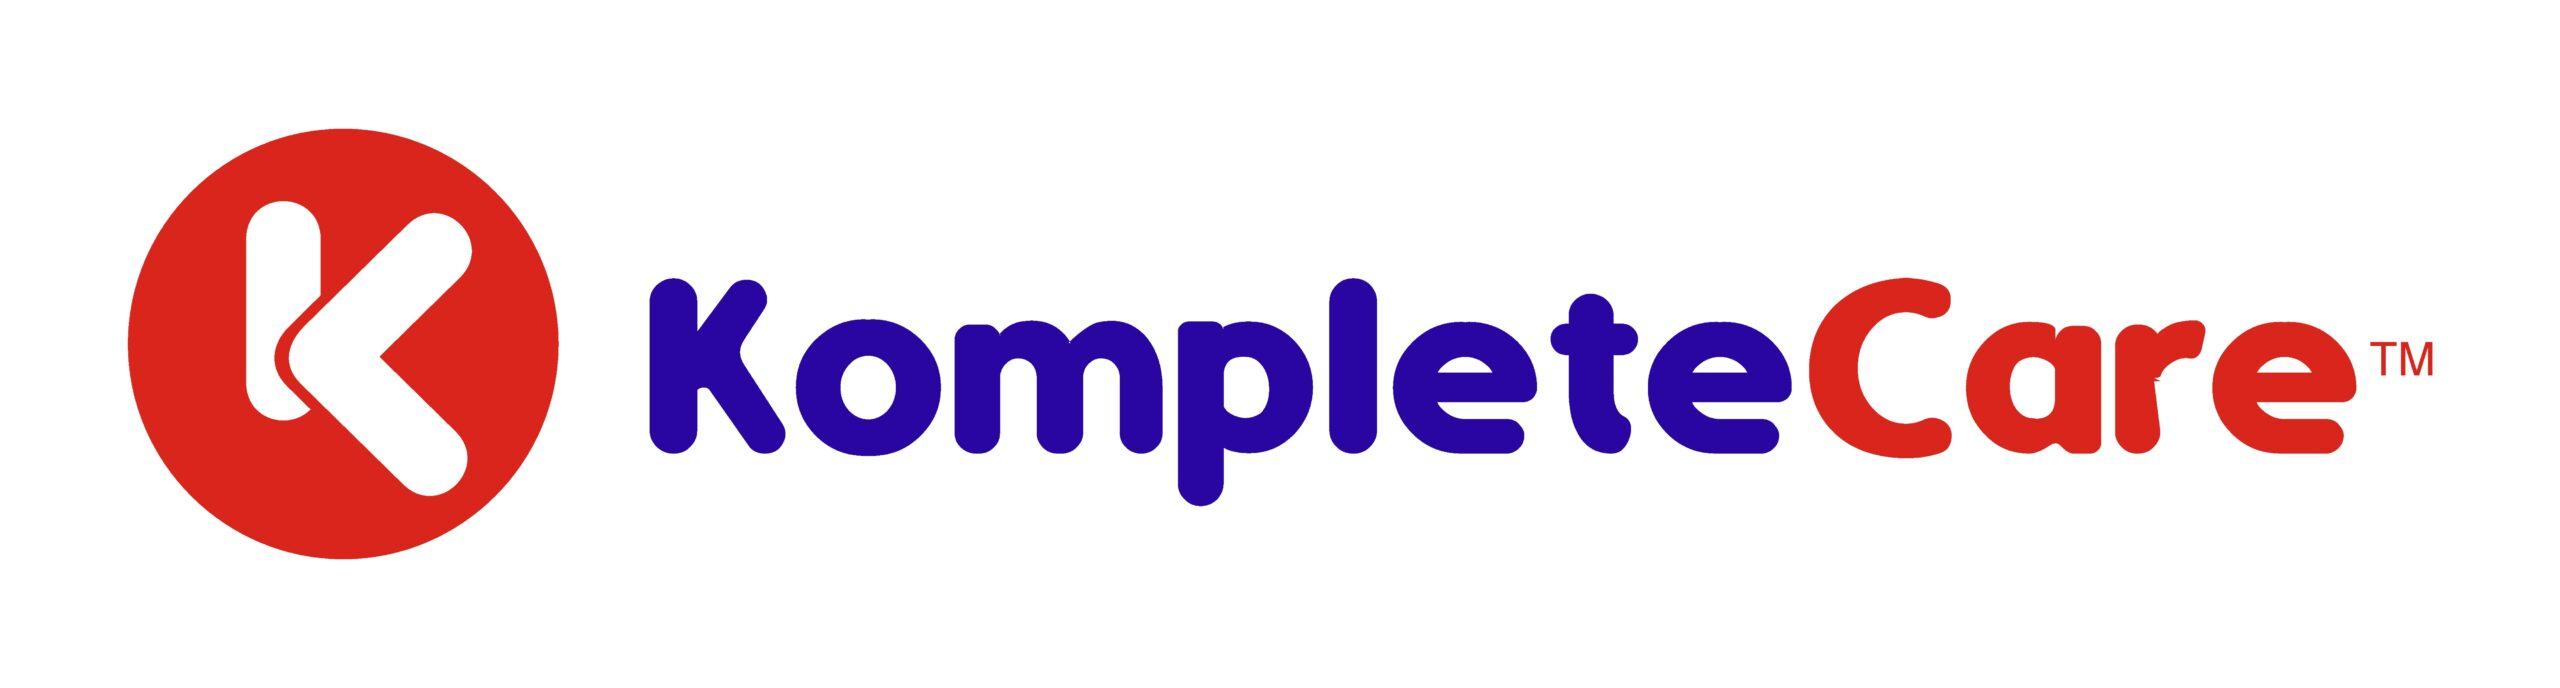 KompleteCare Blog